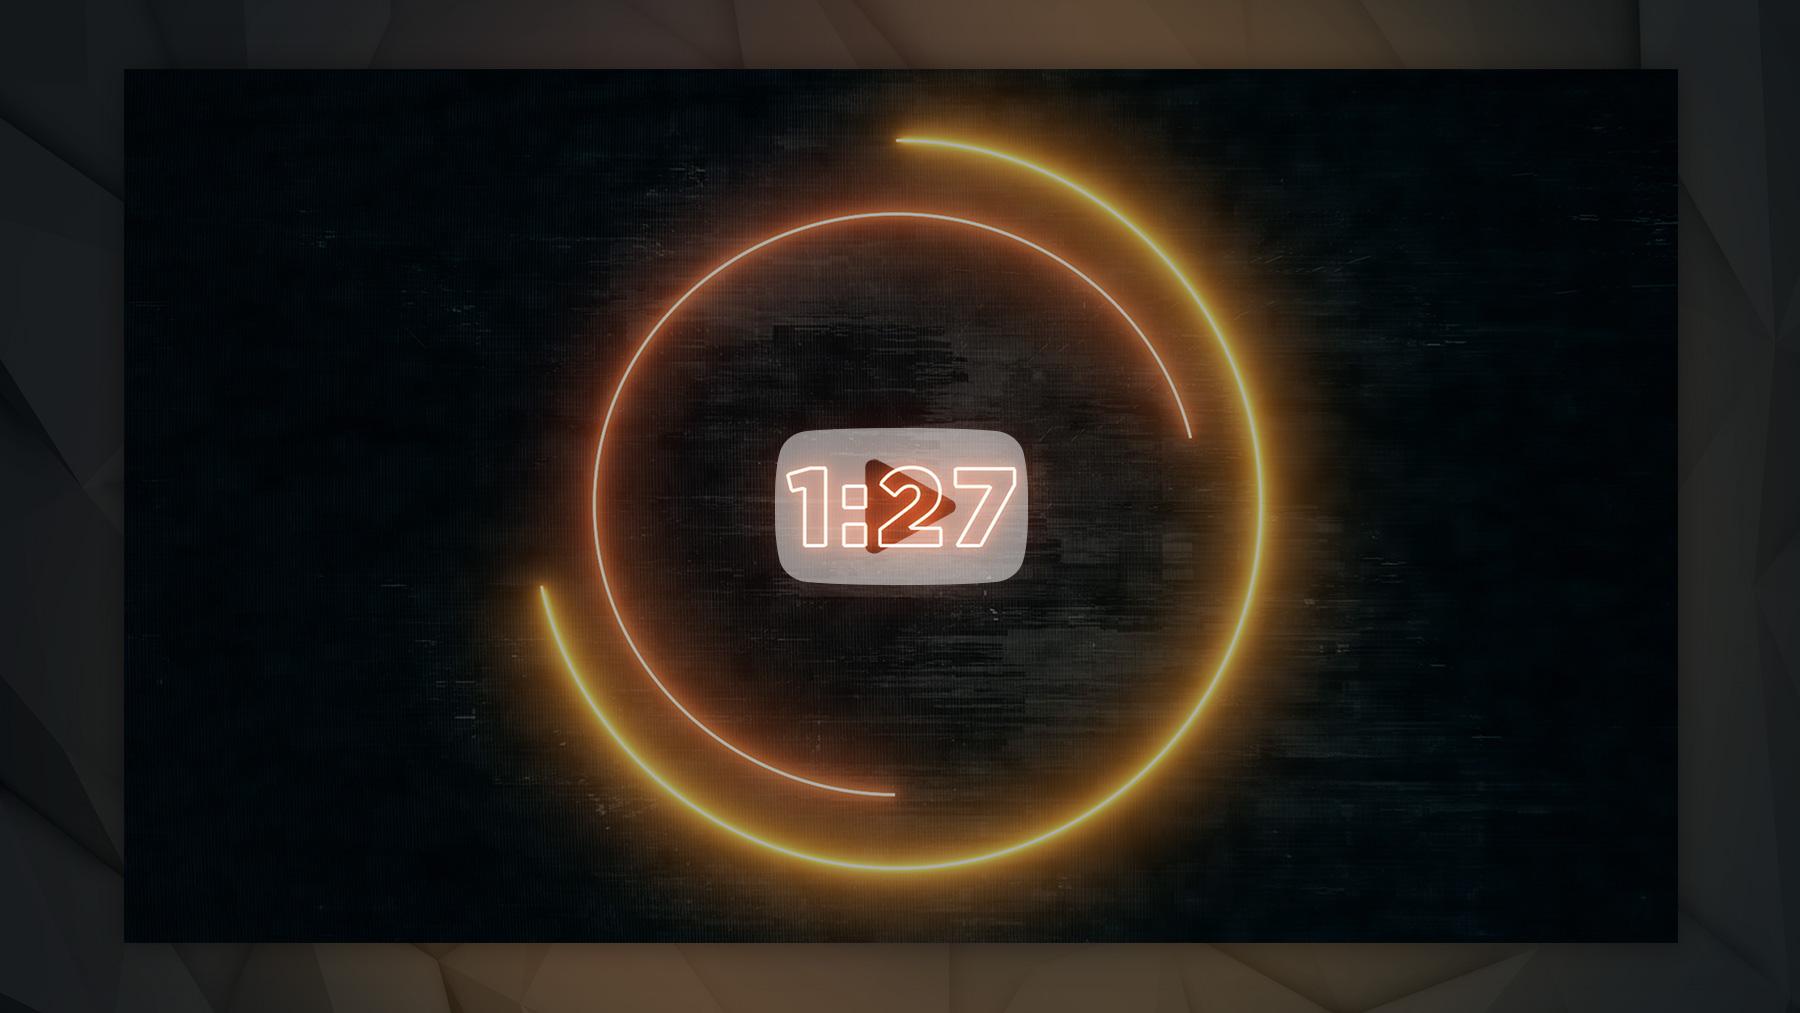 Iitc Countdown Video